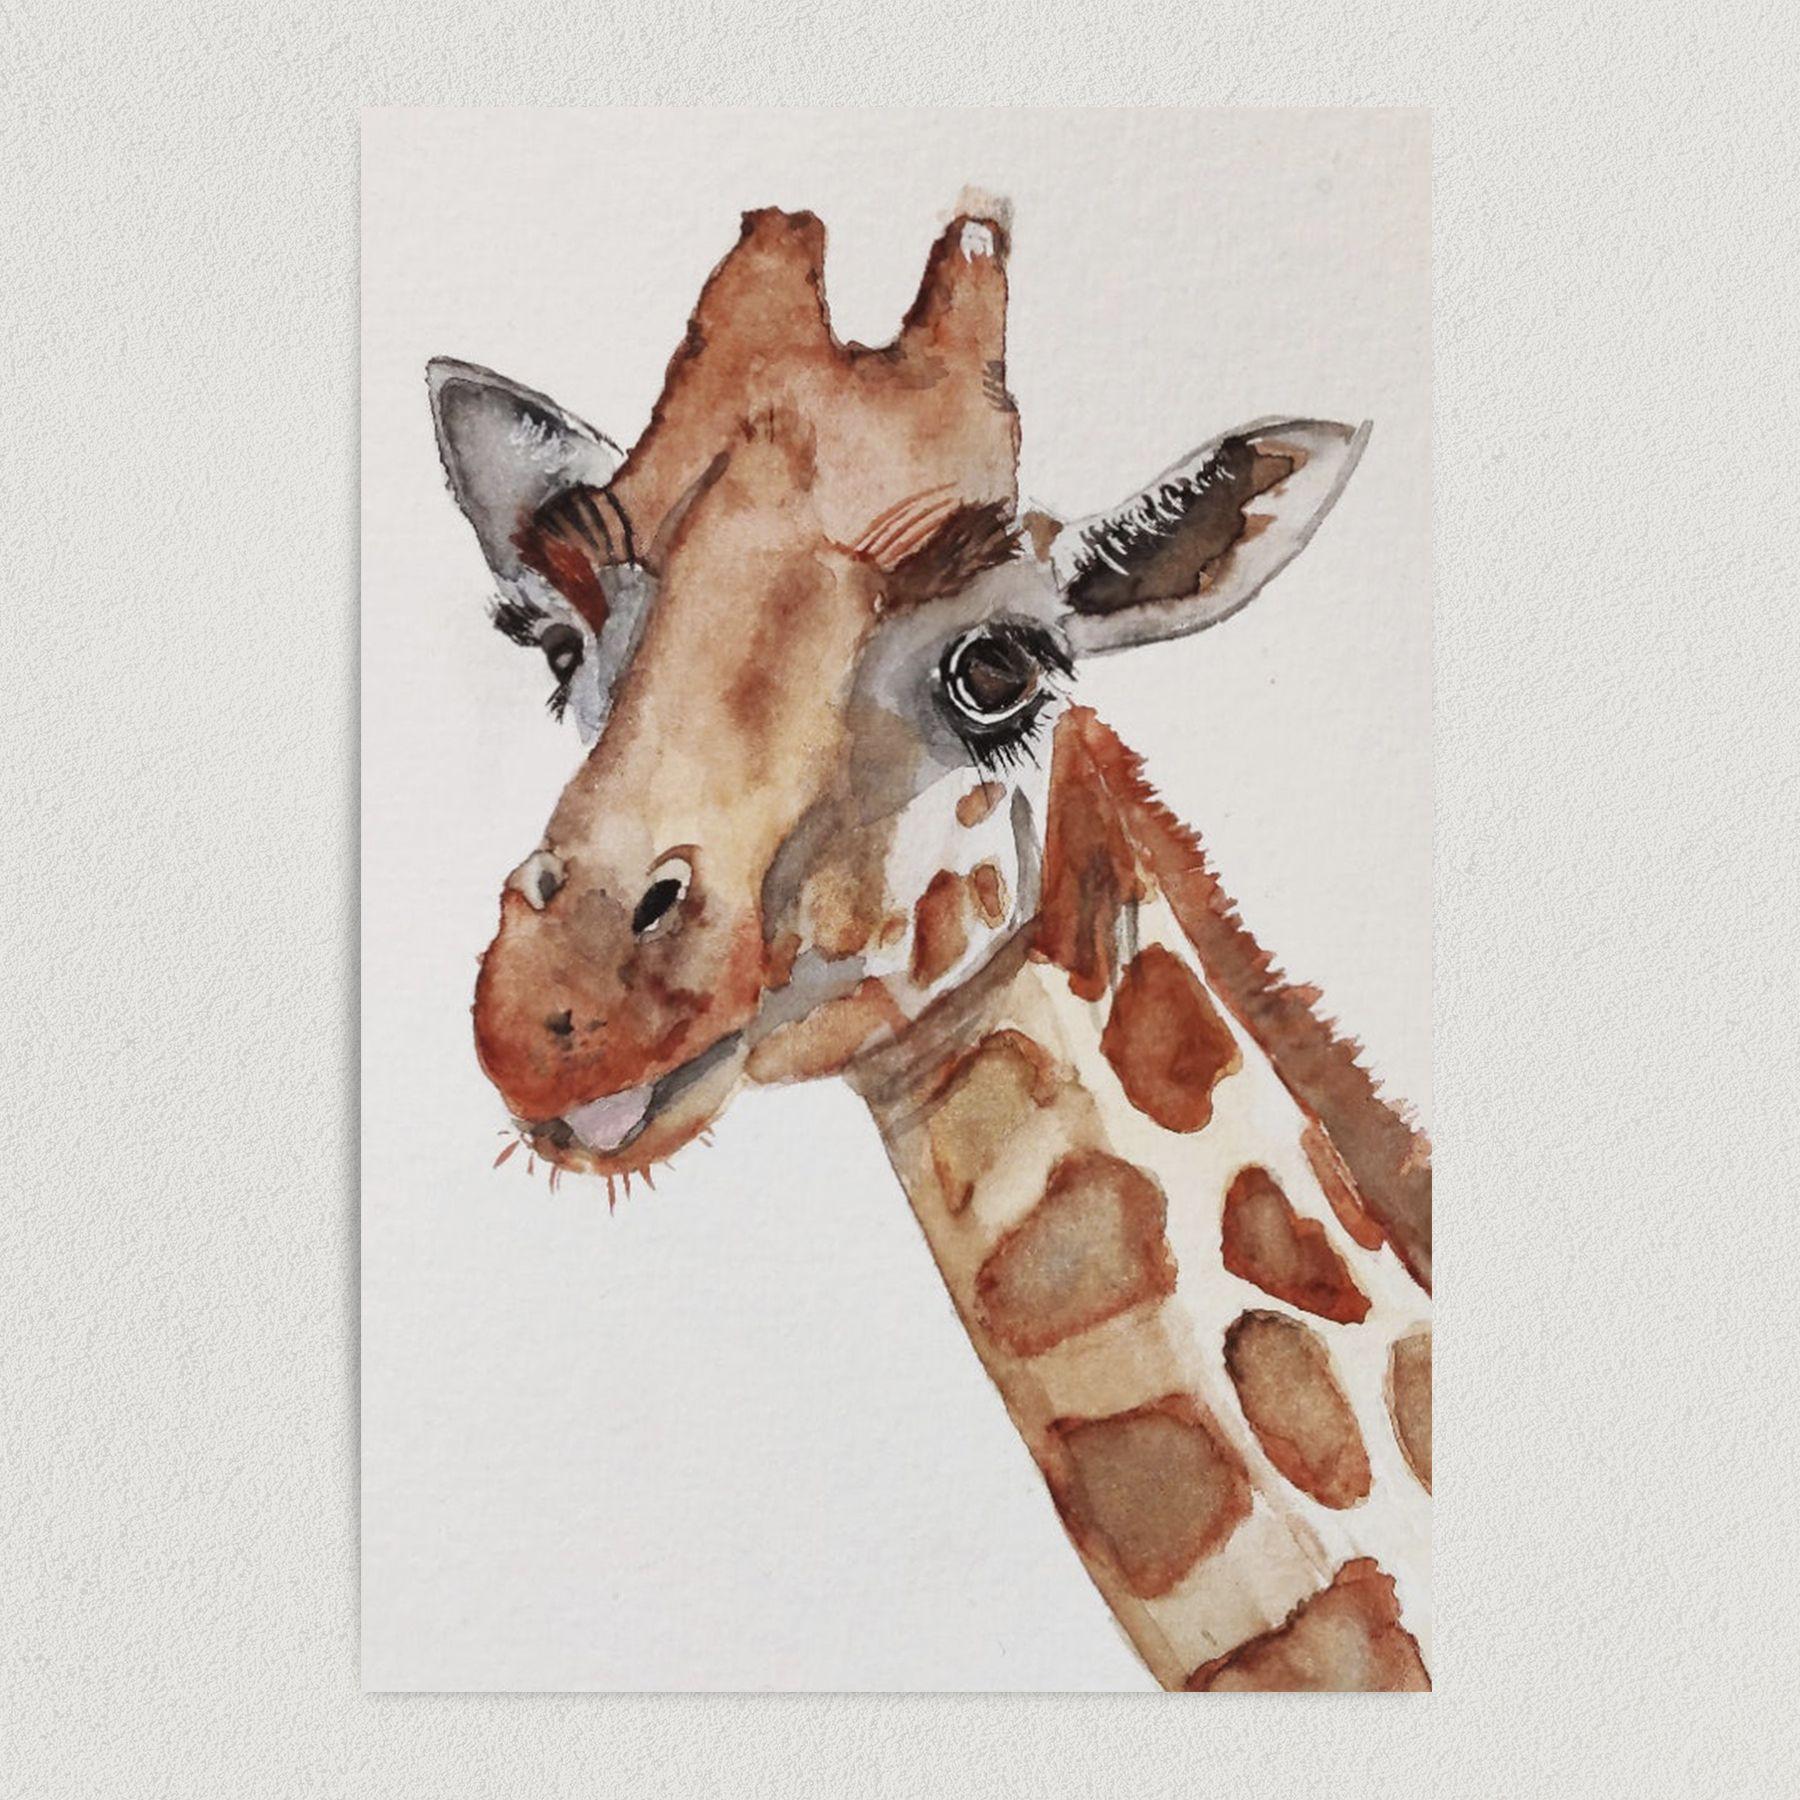 Wild Giraffe Water Painting Art Print Poster 12″ x 18″ Wall Art NO2300